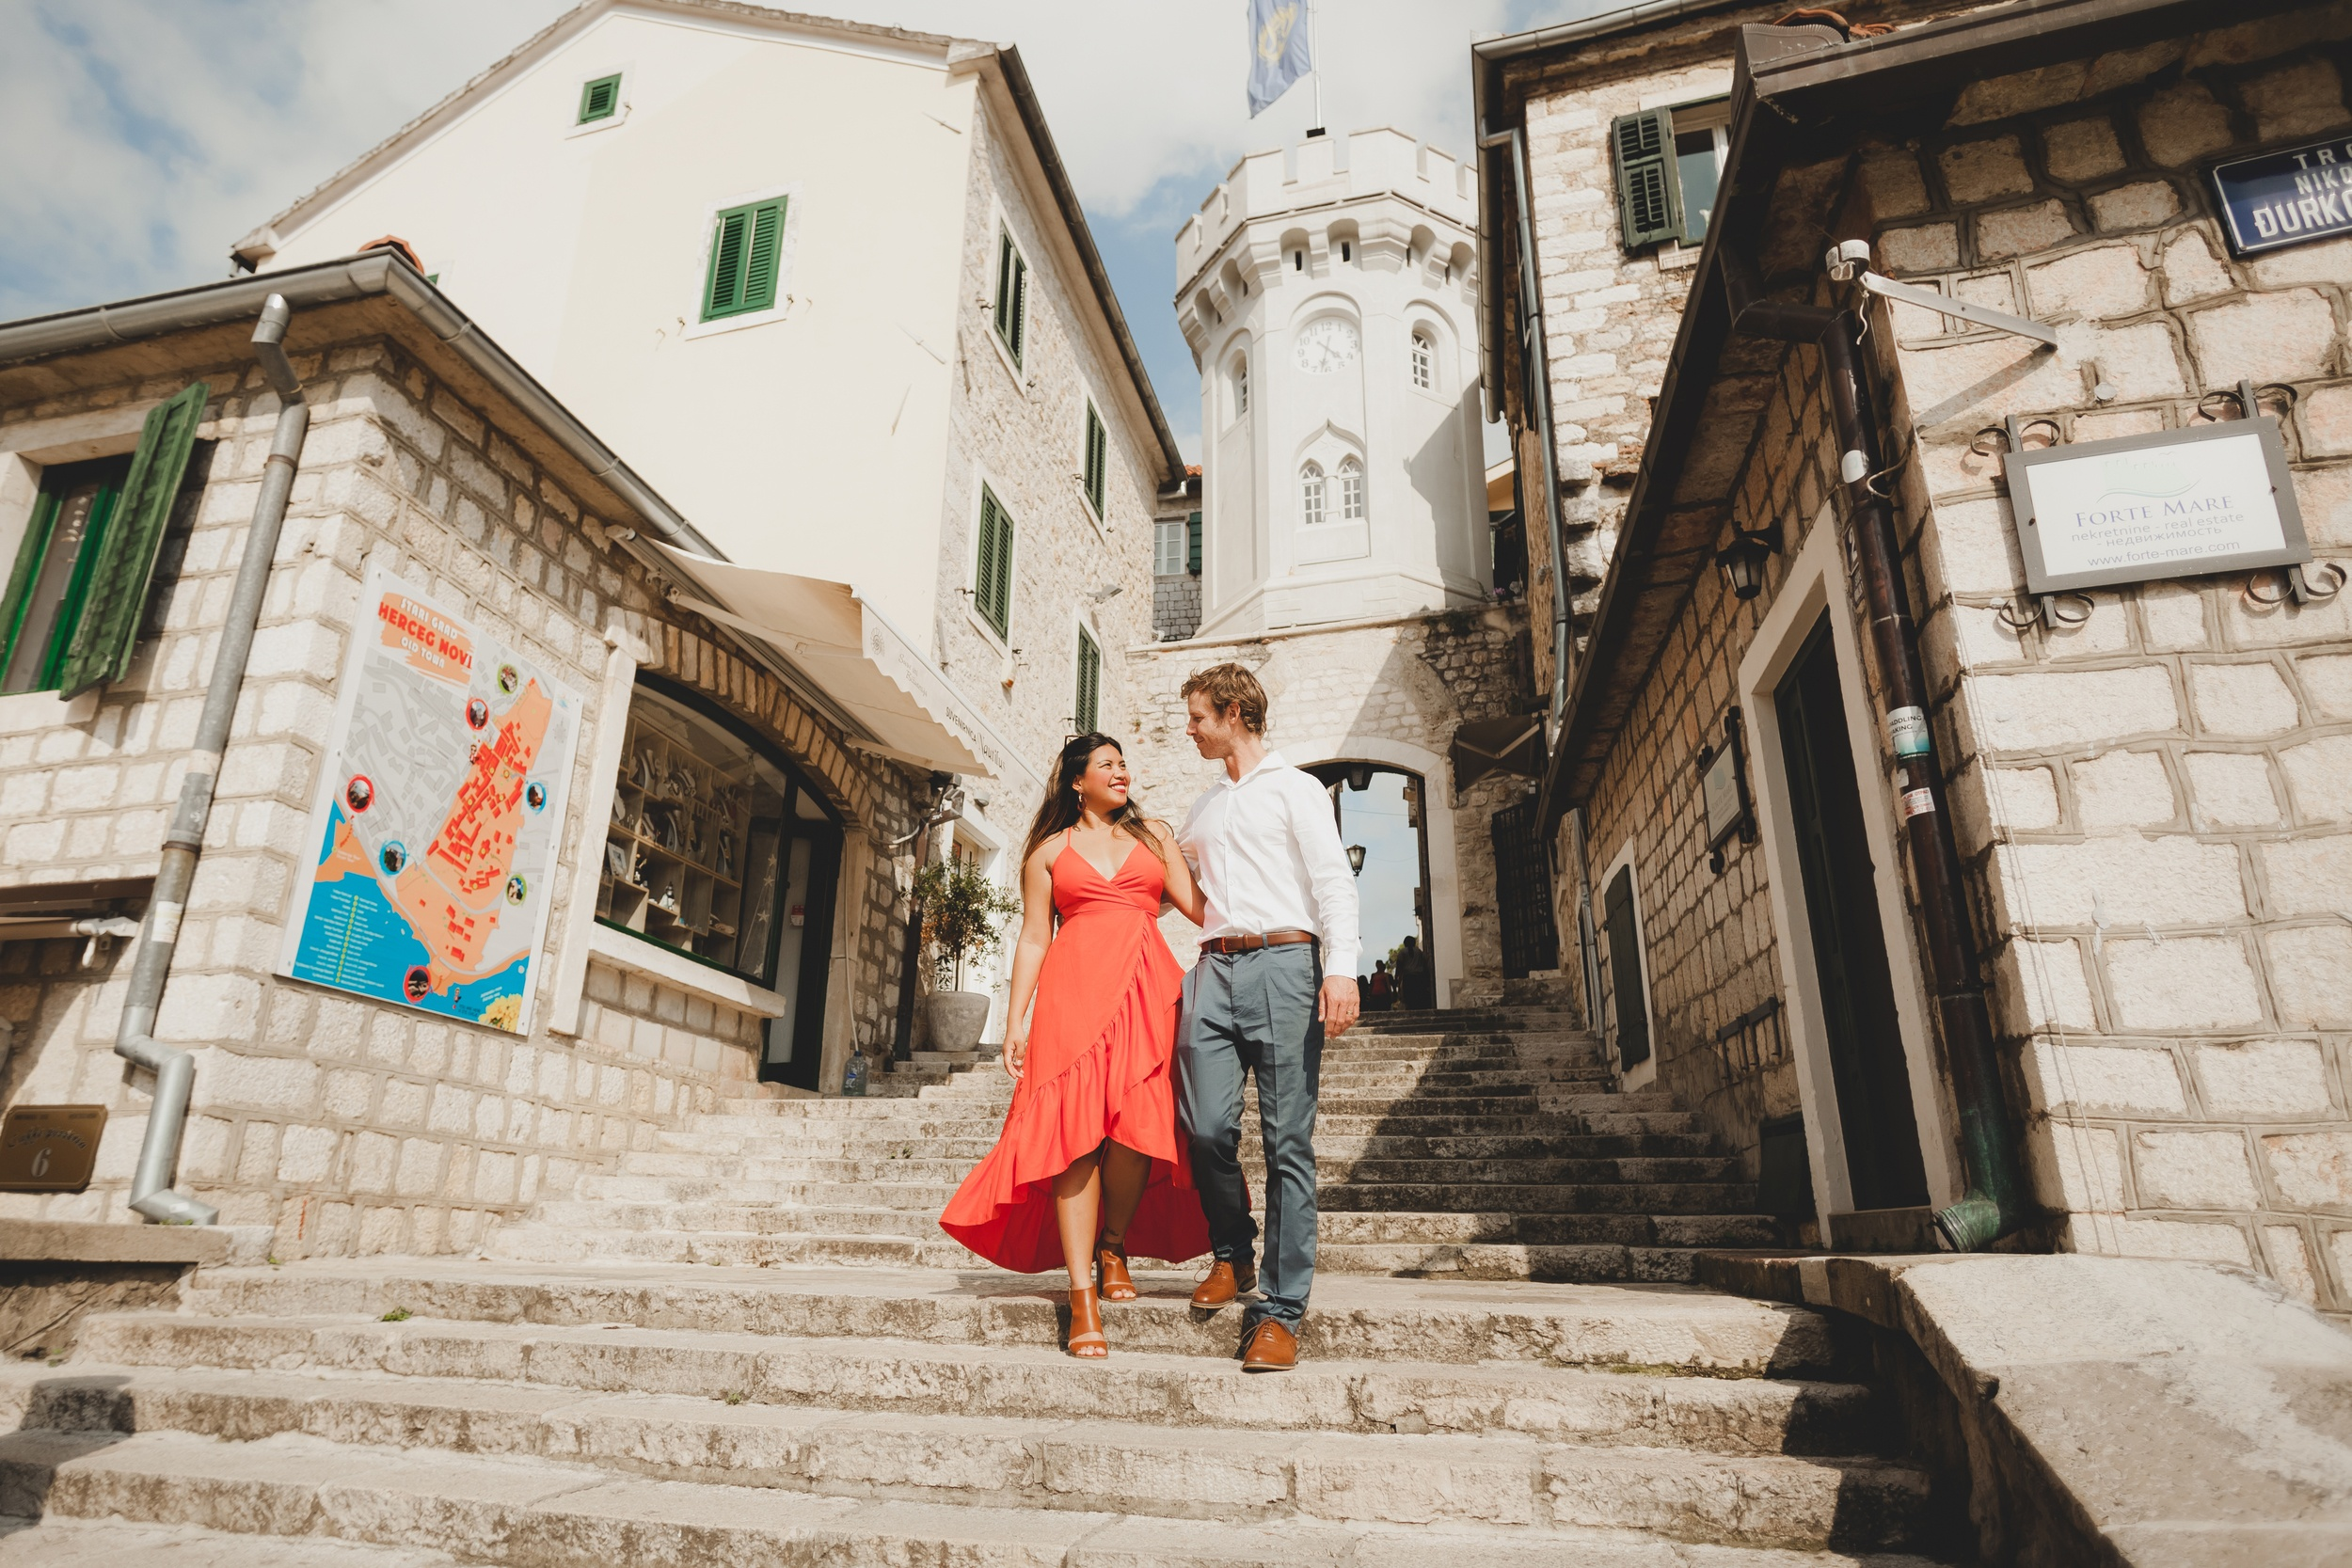 Things to do in Herceg, Montenegro